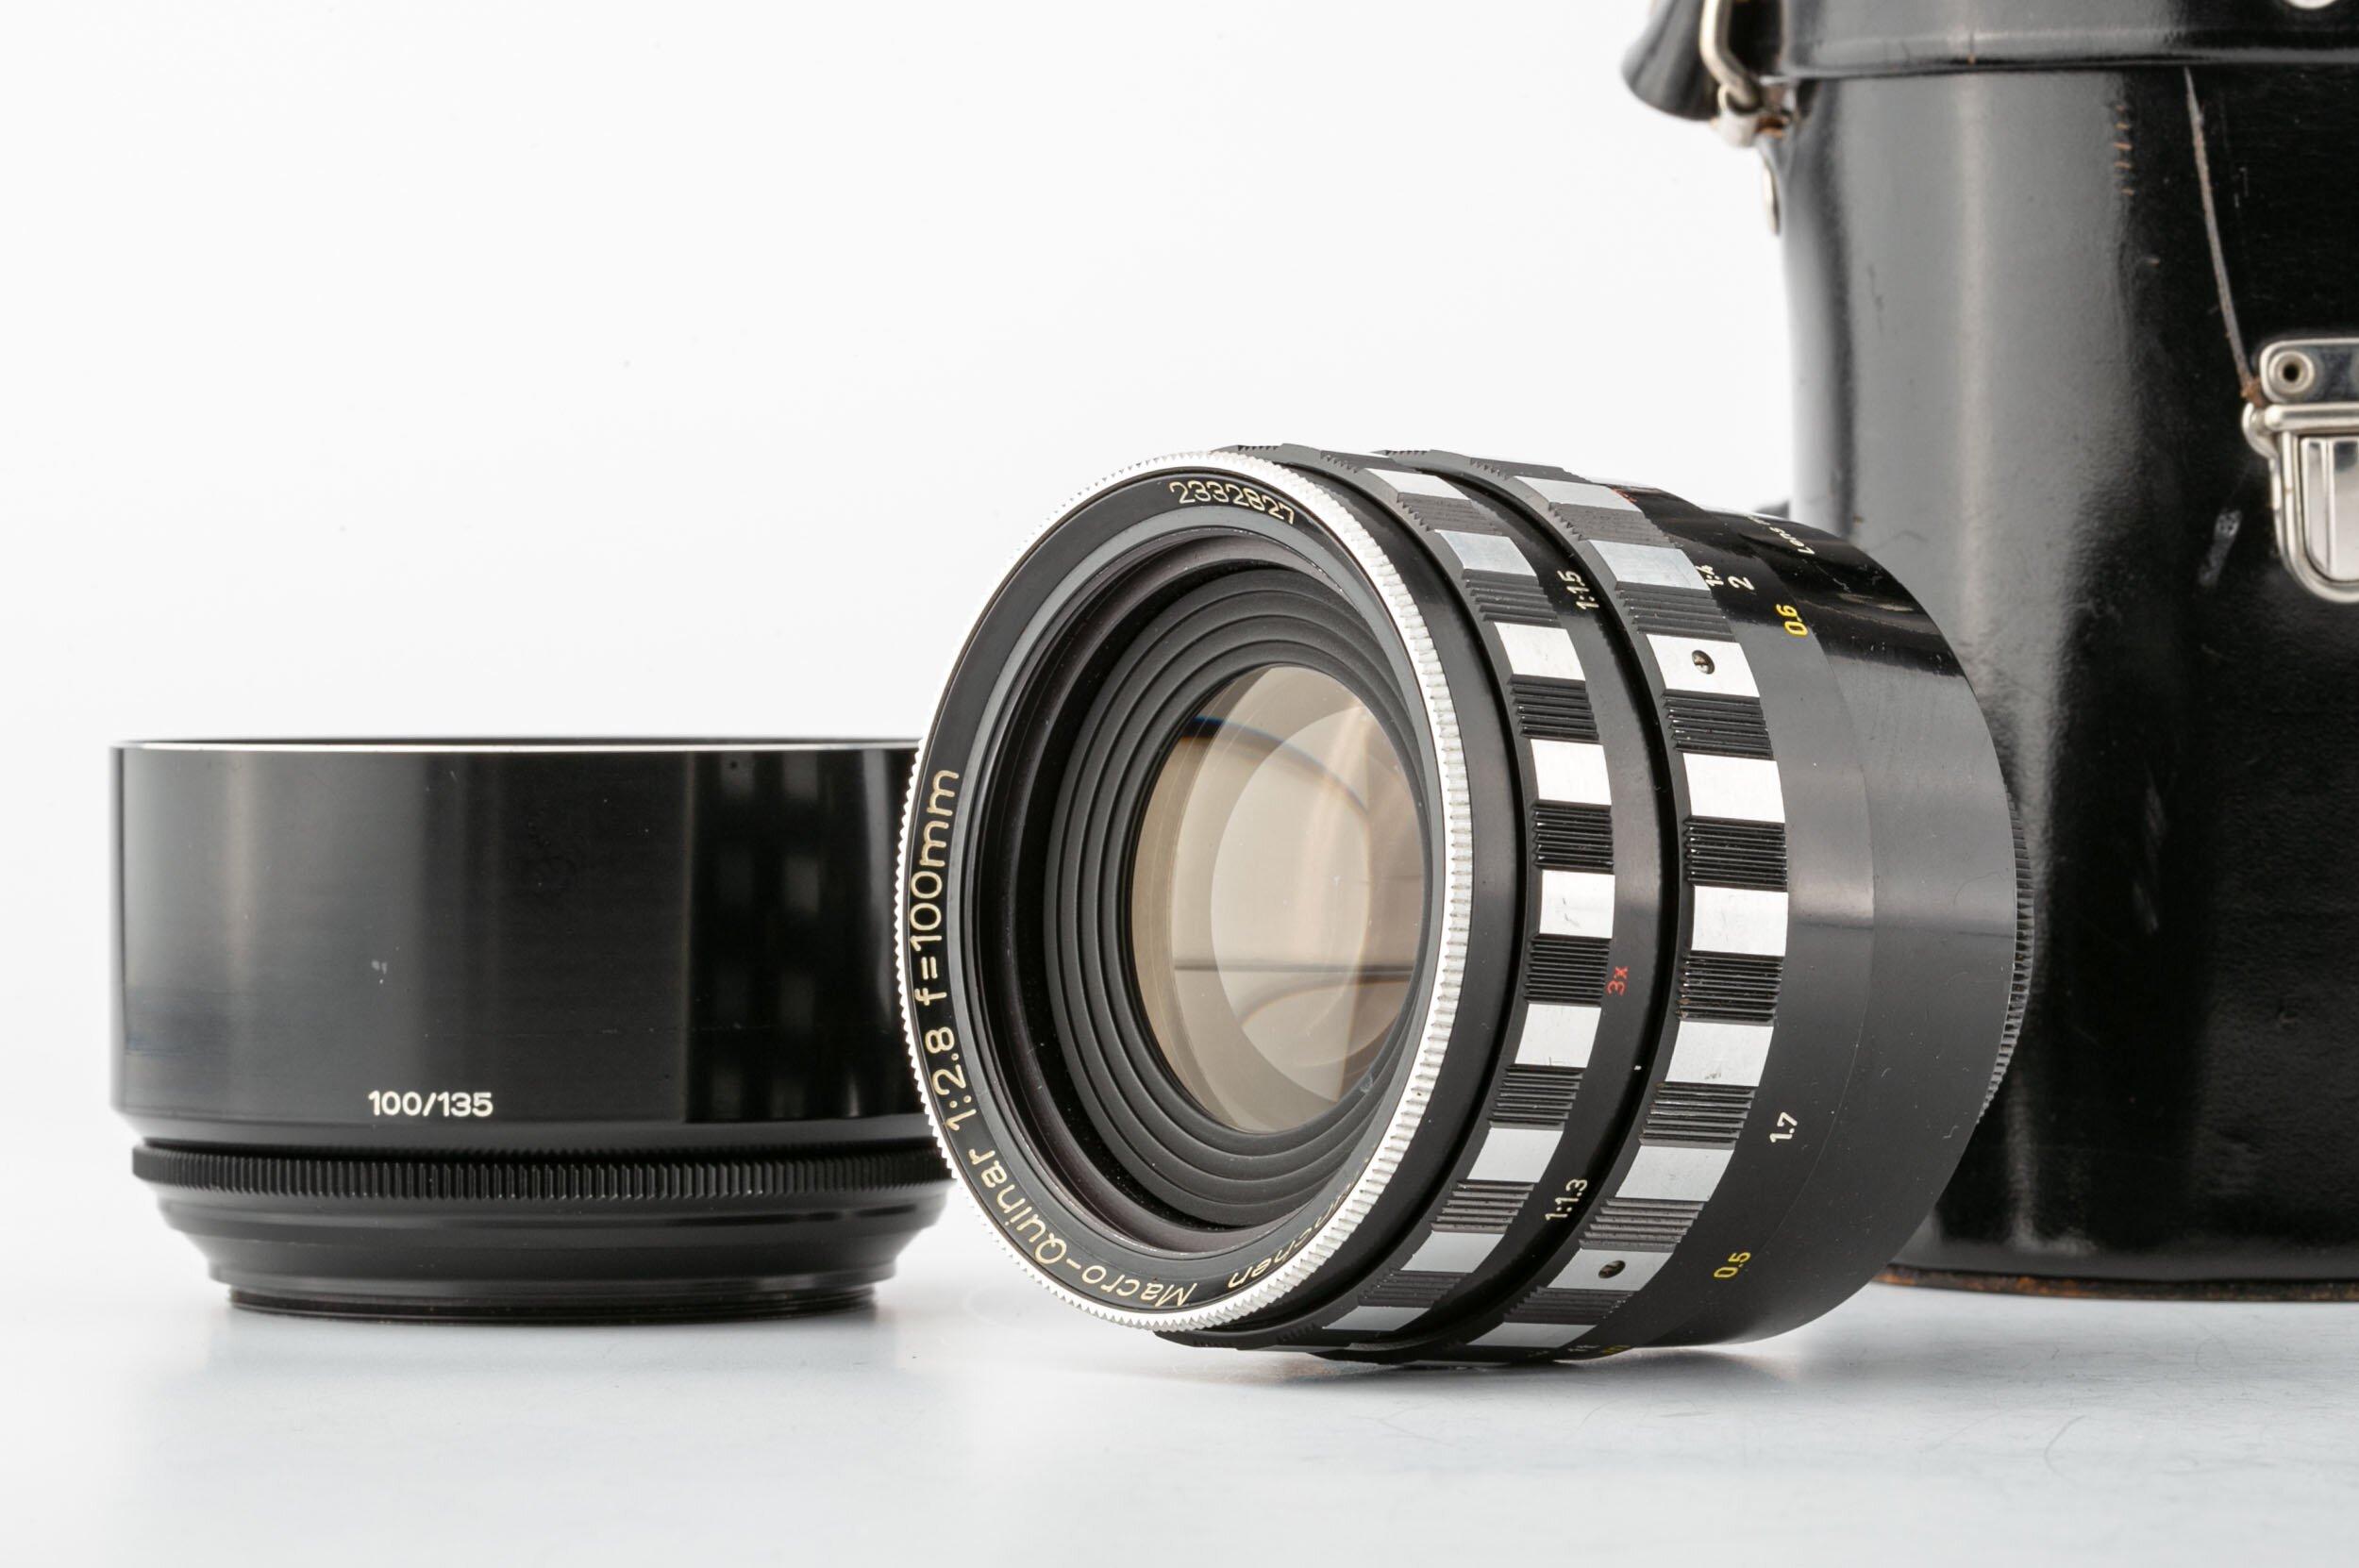 Steinheil Objektiv Macro-Quinar 2,8/100 mm Exakta